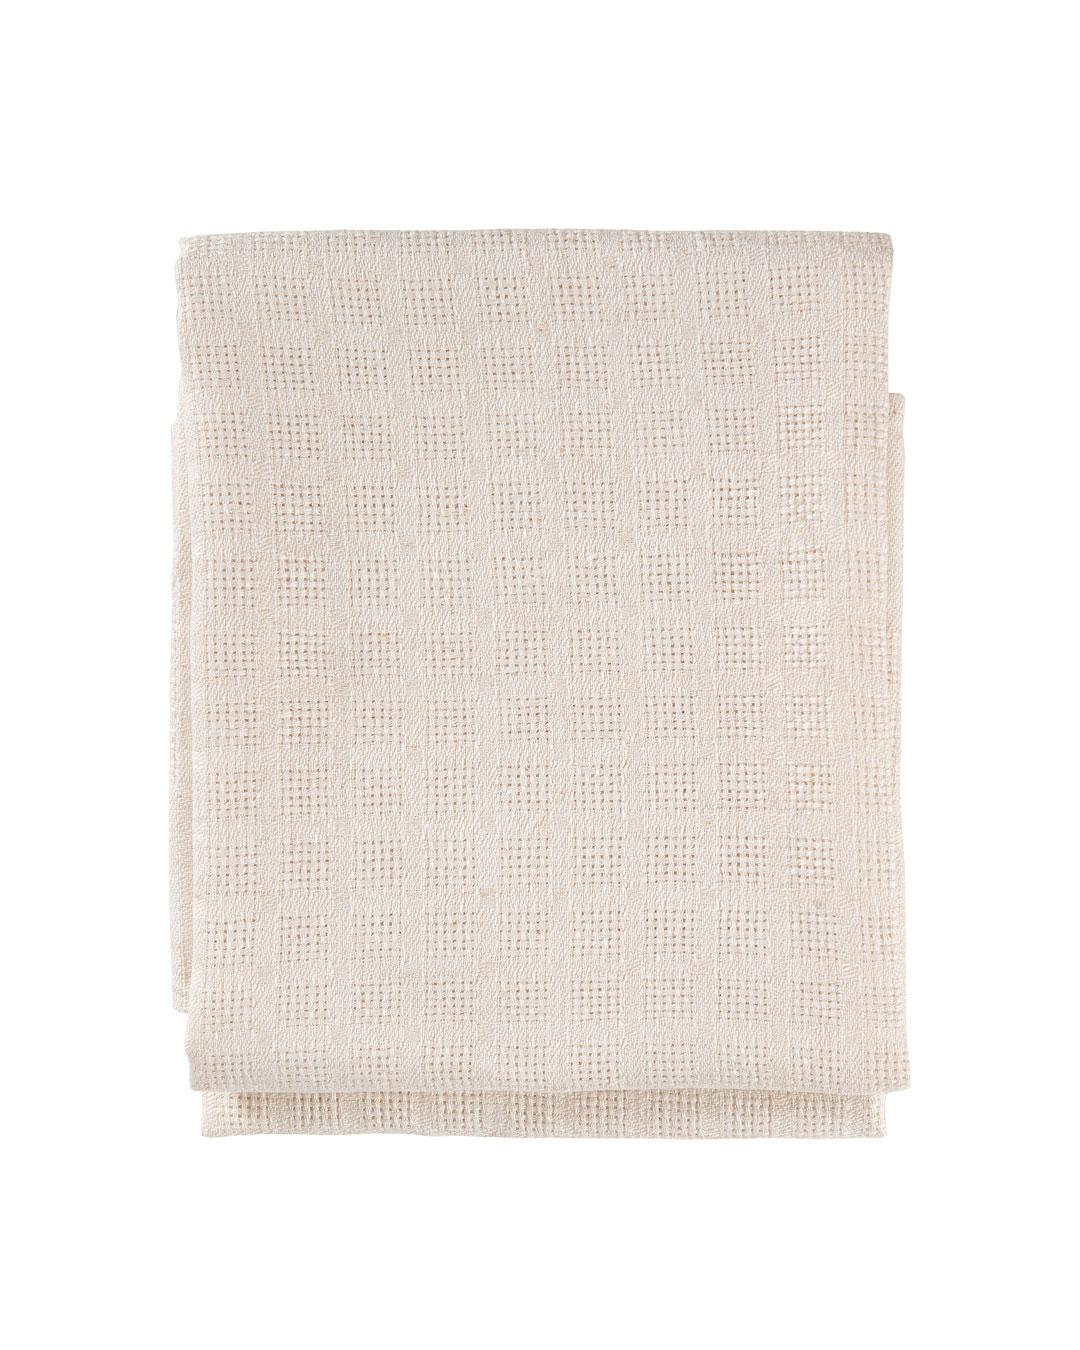 Annelies Planteijdt, Beautiful City - Necklace with Tea Towels, 2017, tea towel (image 3/3)